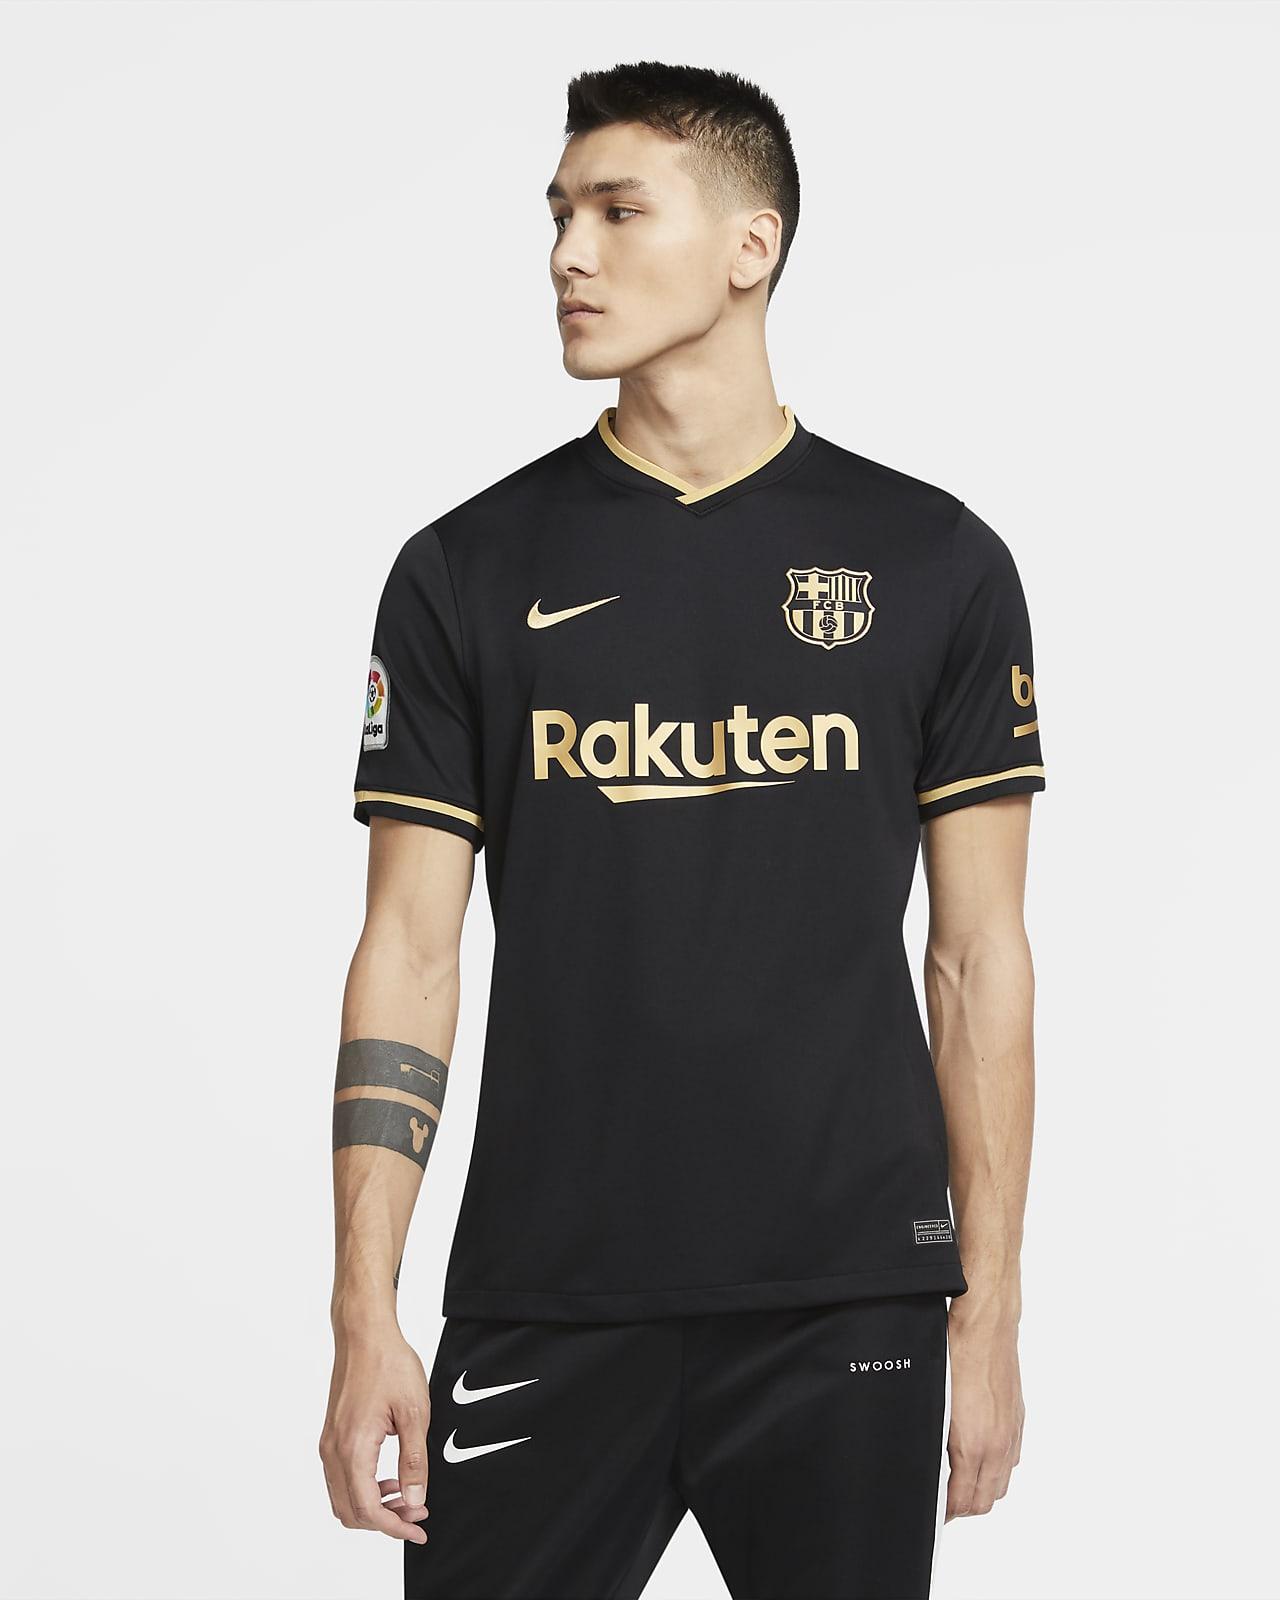 Pánský fotbalový dres FC Barcelona 2020/21 Stadium, venkovní